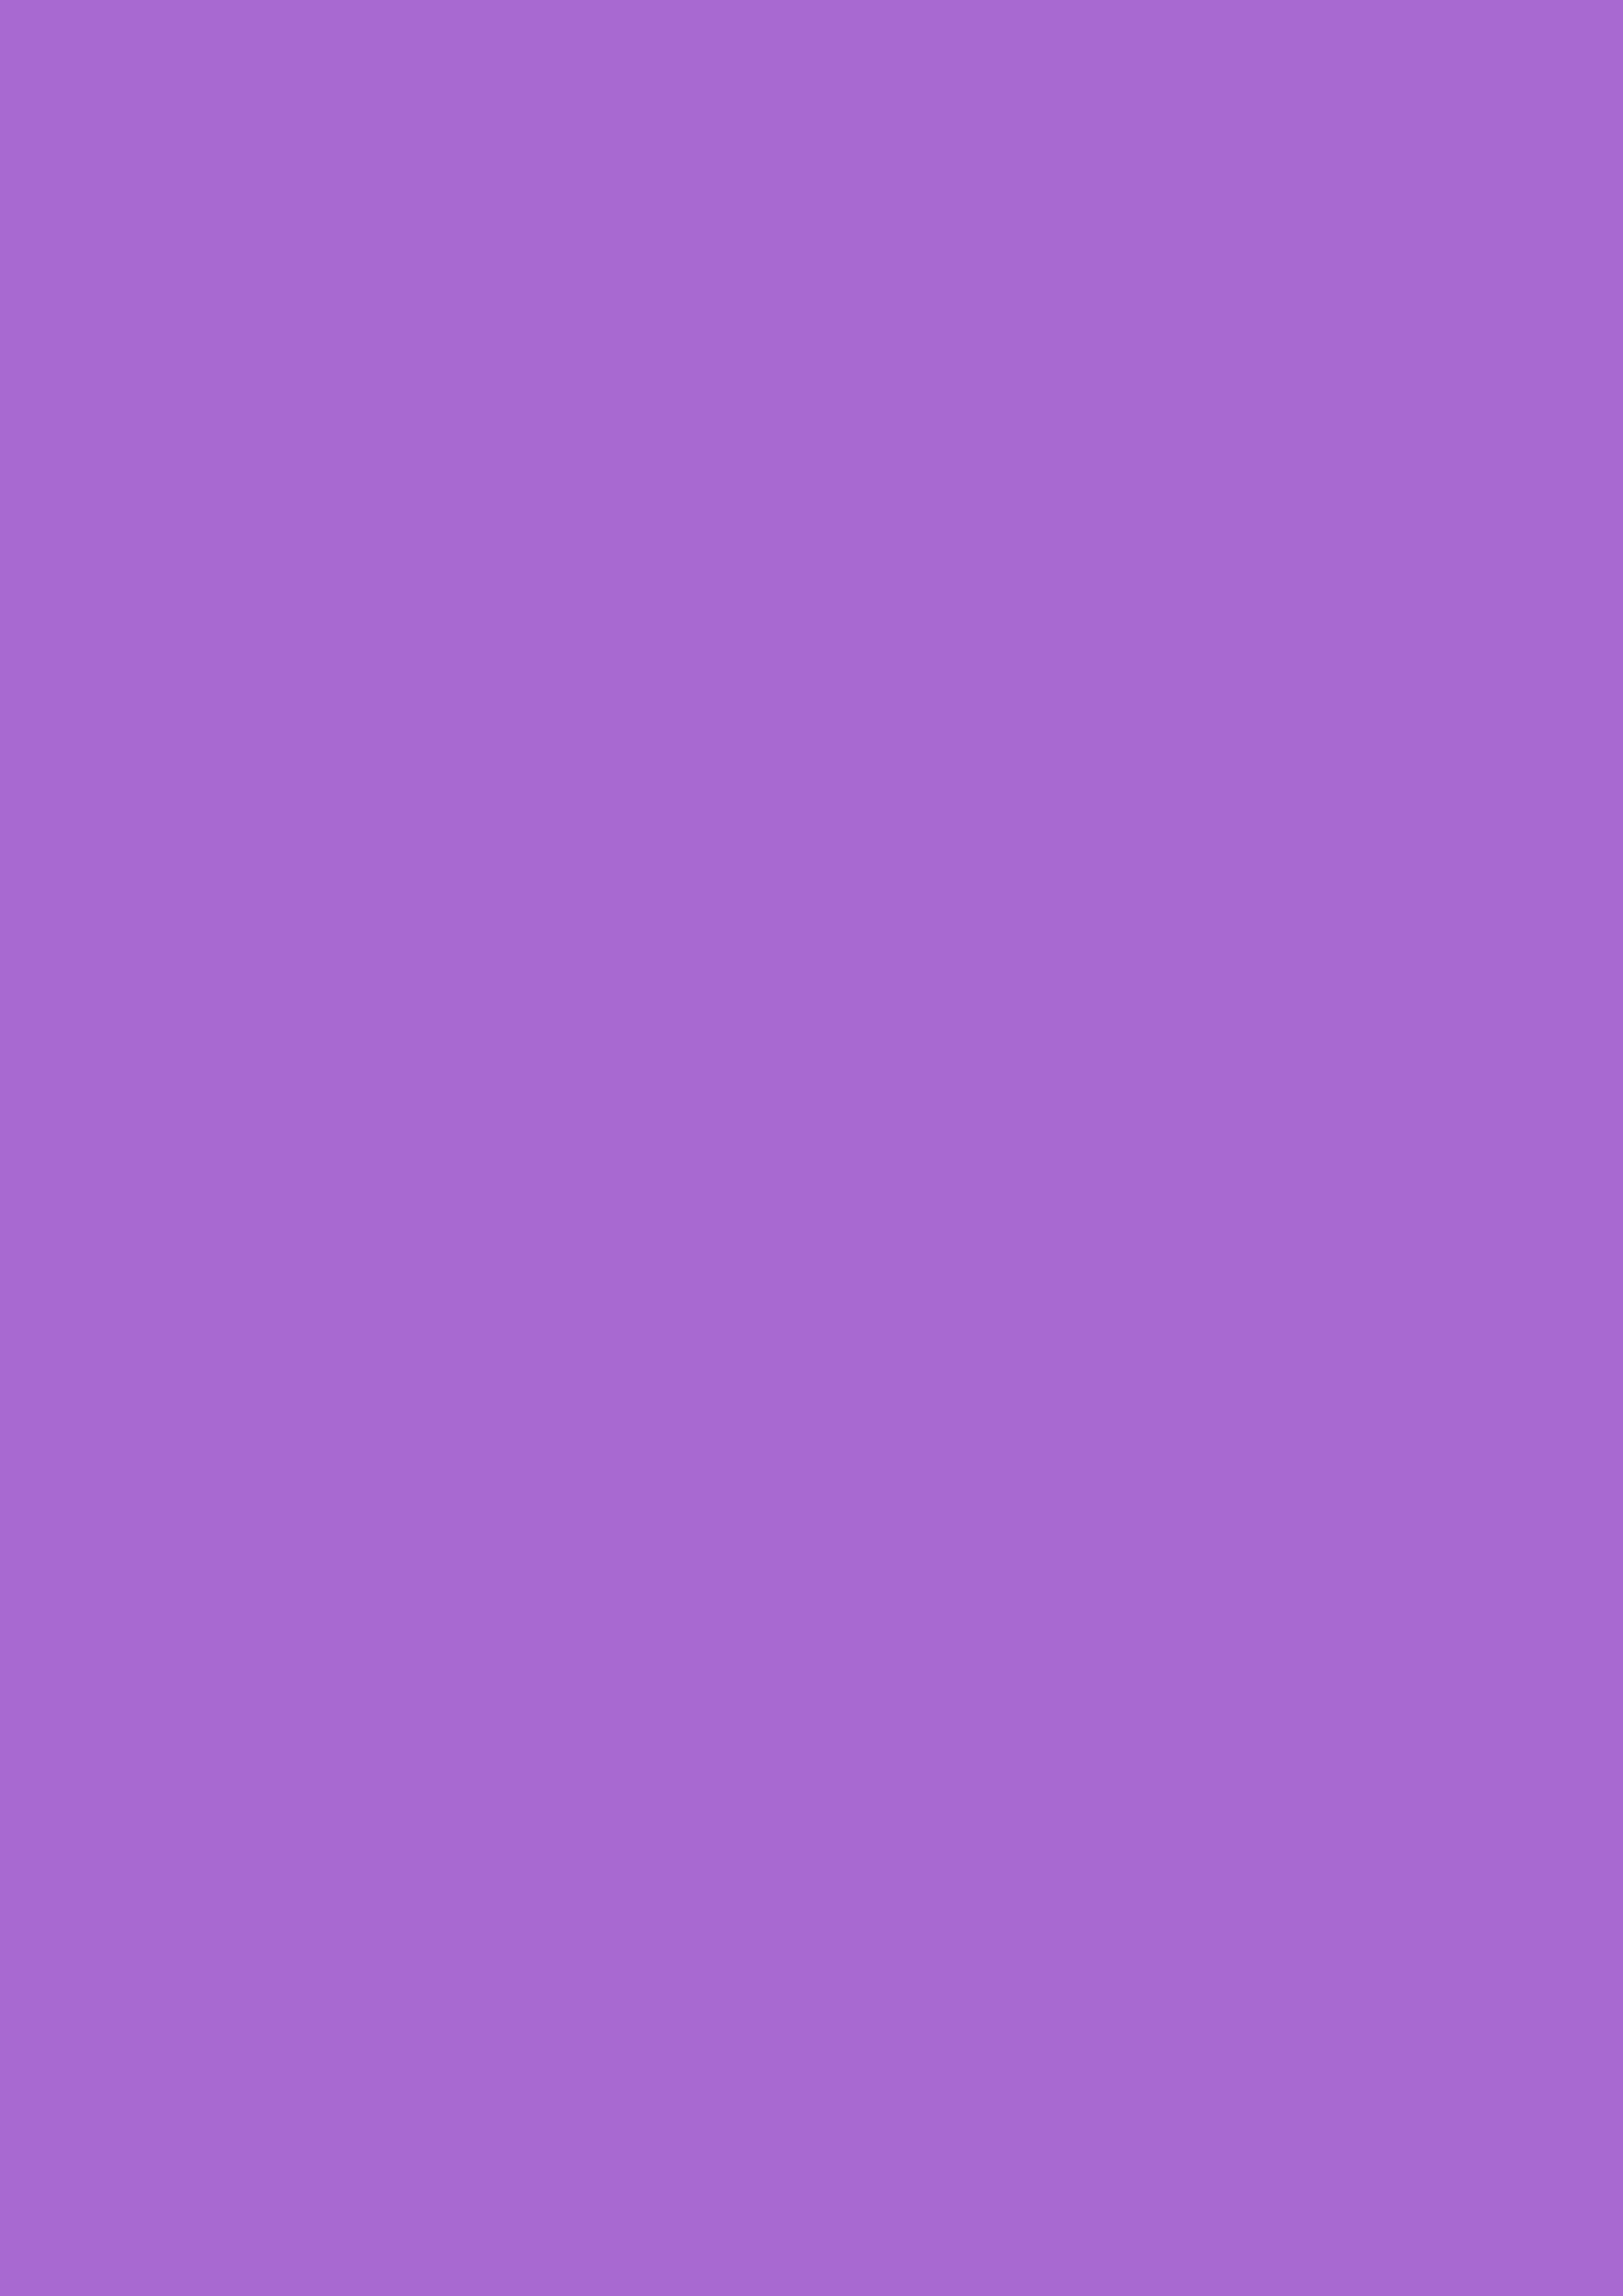 2480x3508 Rich Lavender Solid Color Background